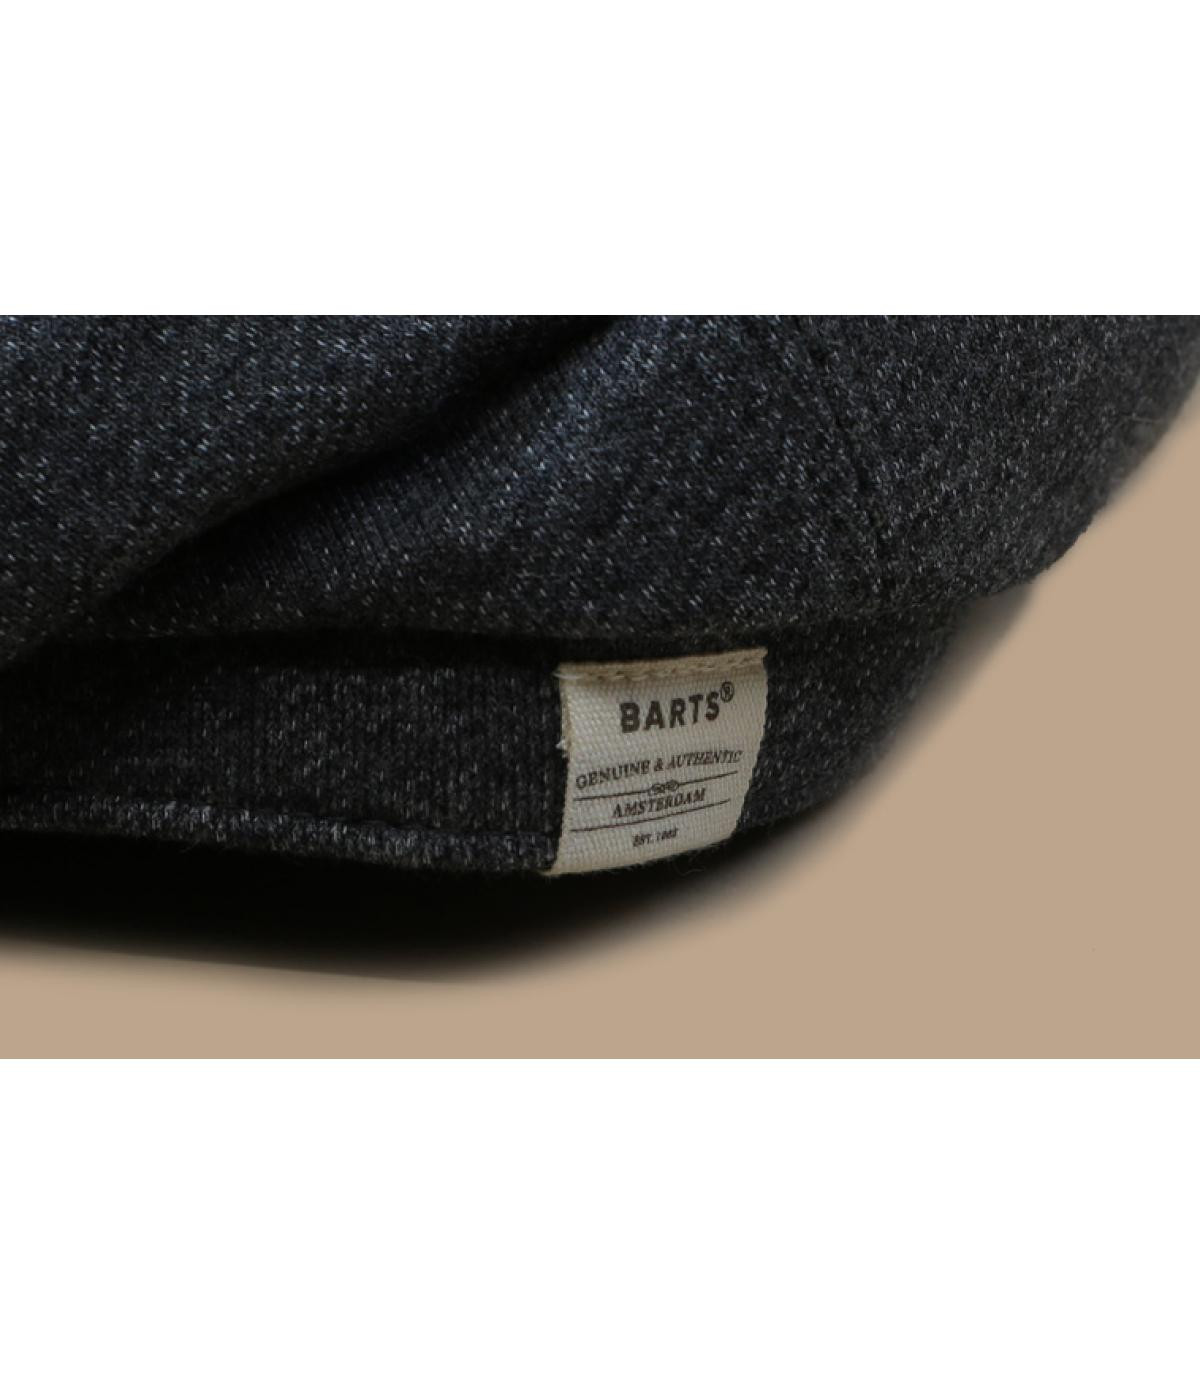 Dettagli Bunga grey - image 3